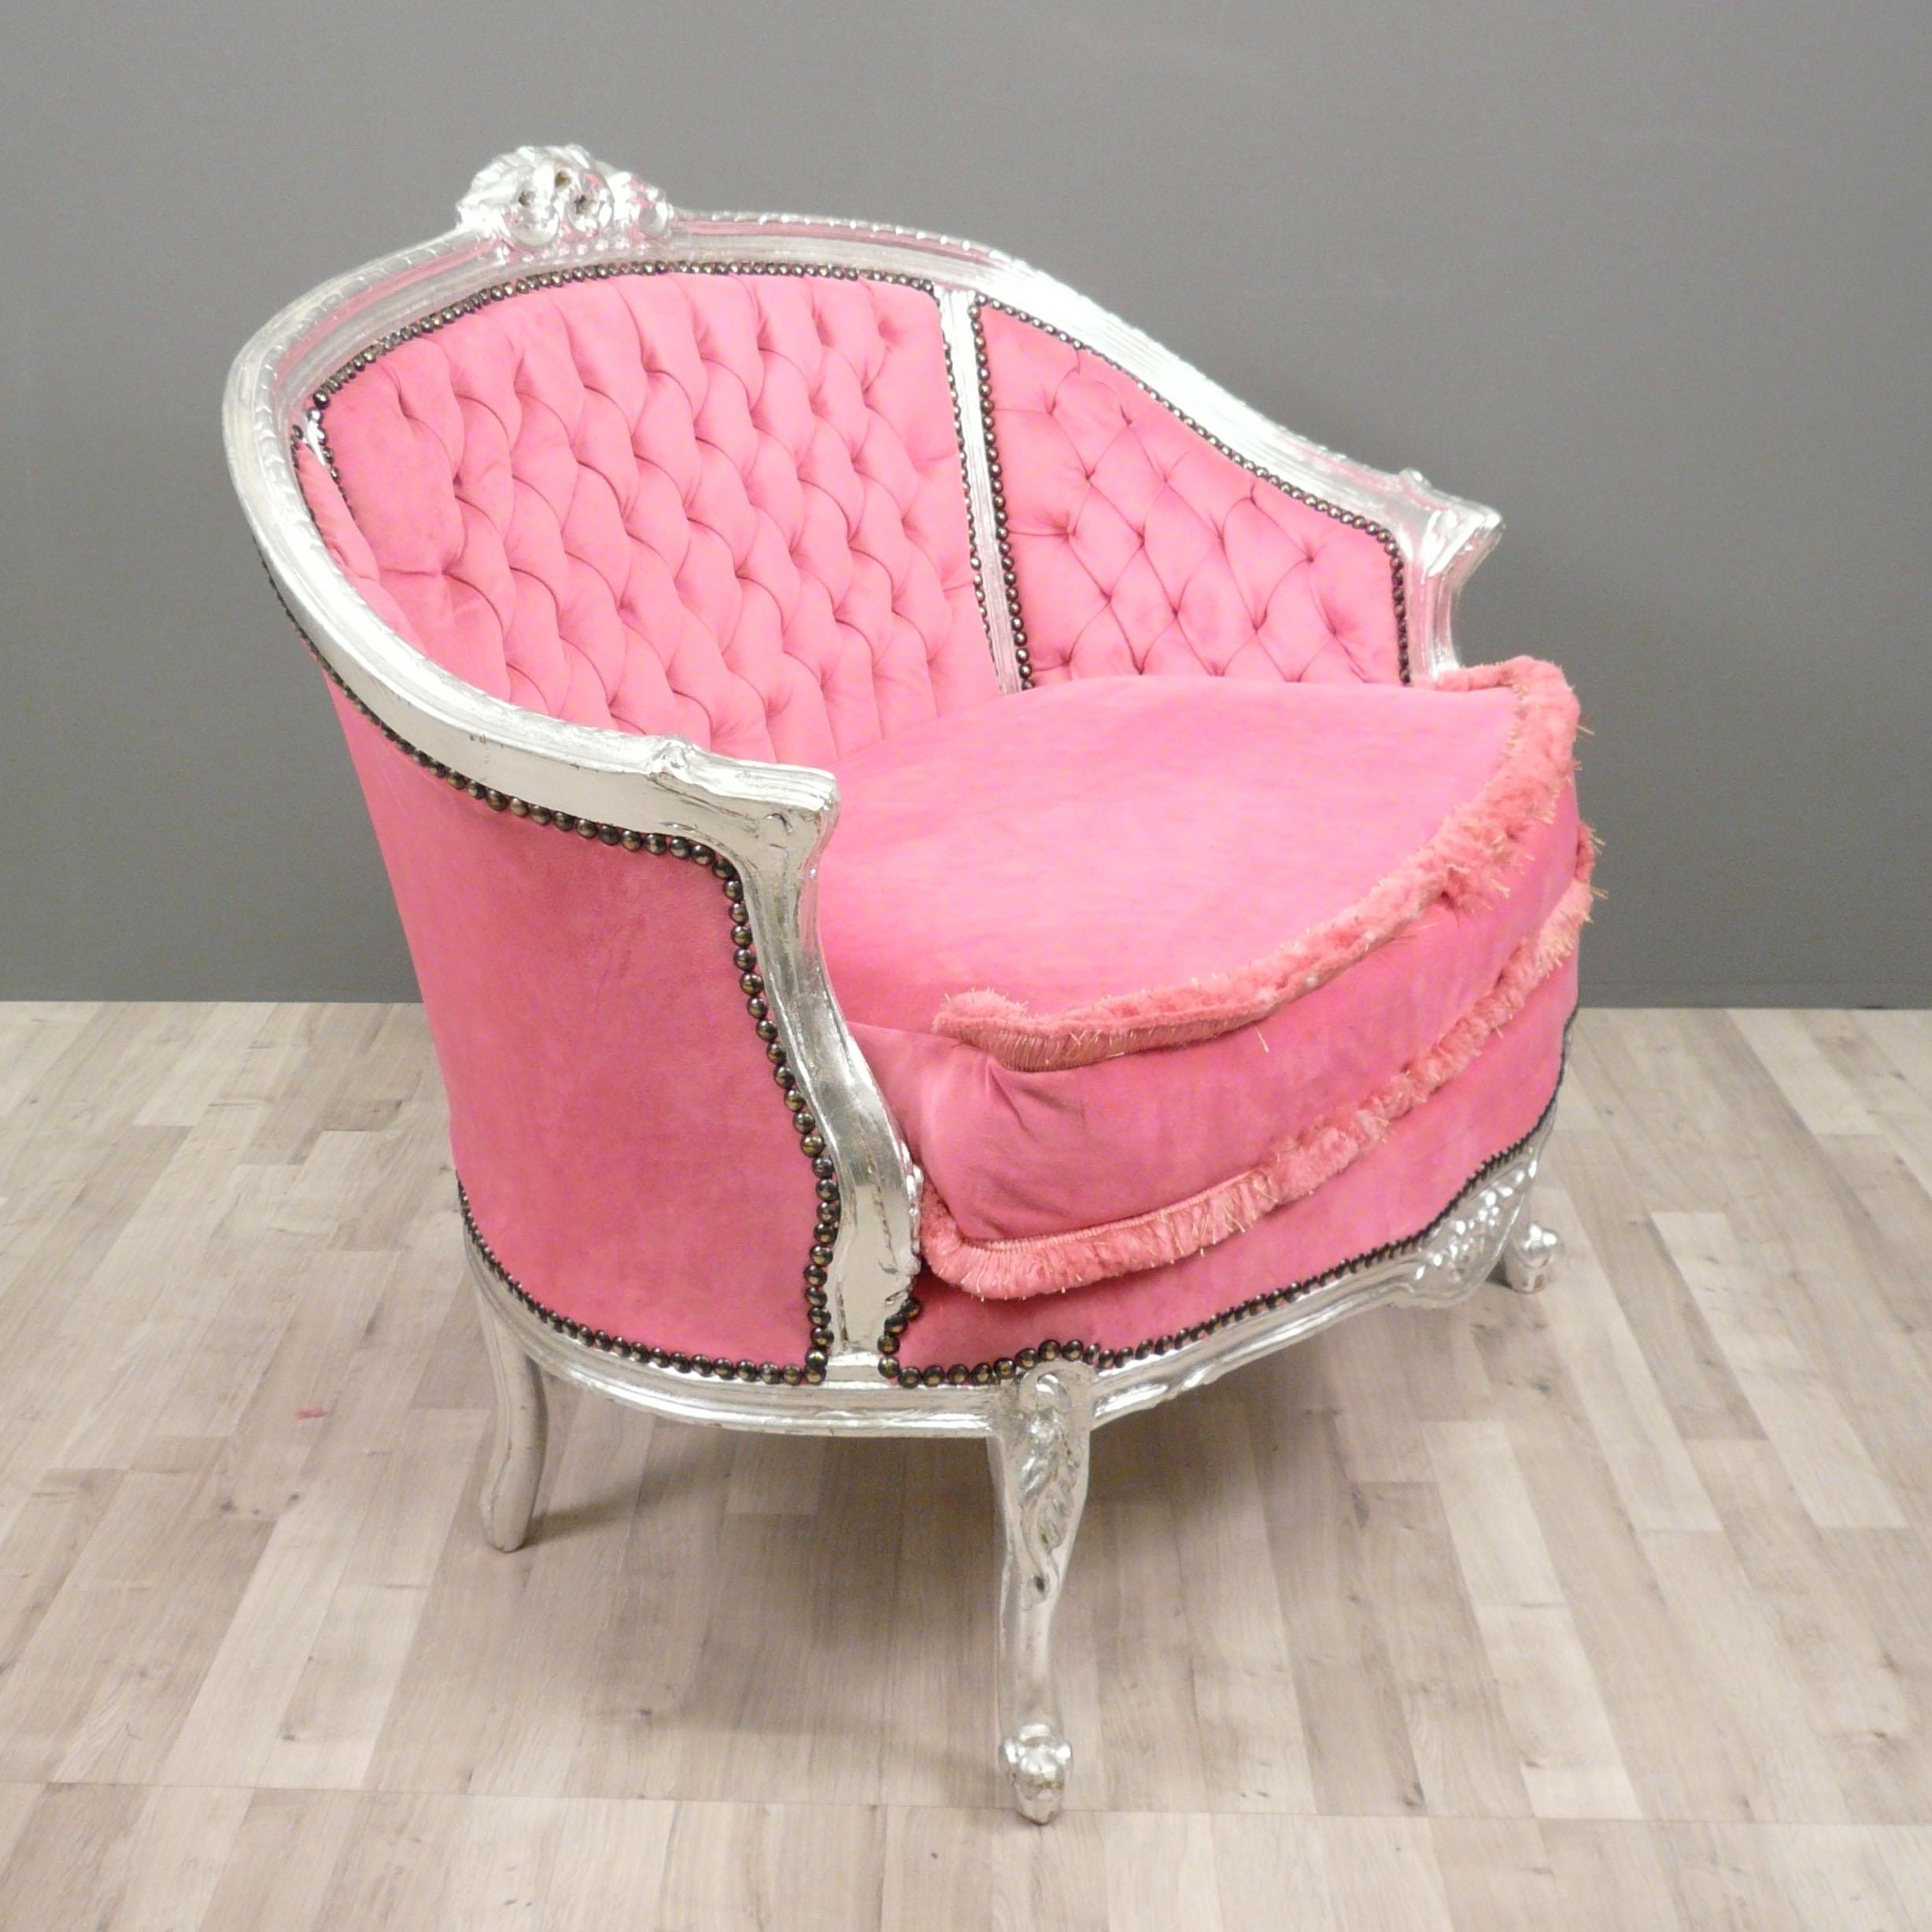 baroque sofa pink bronze statue. Black Bedroom Furniture Sets. Home Design Ideas